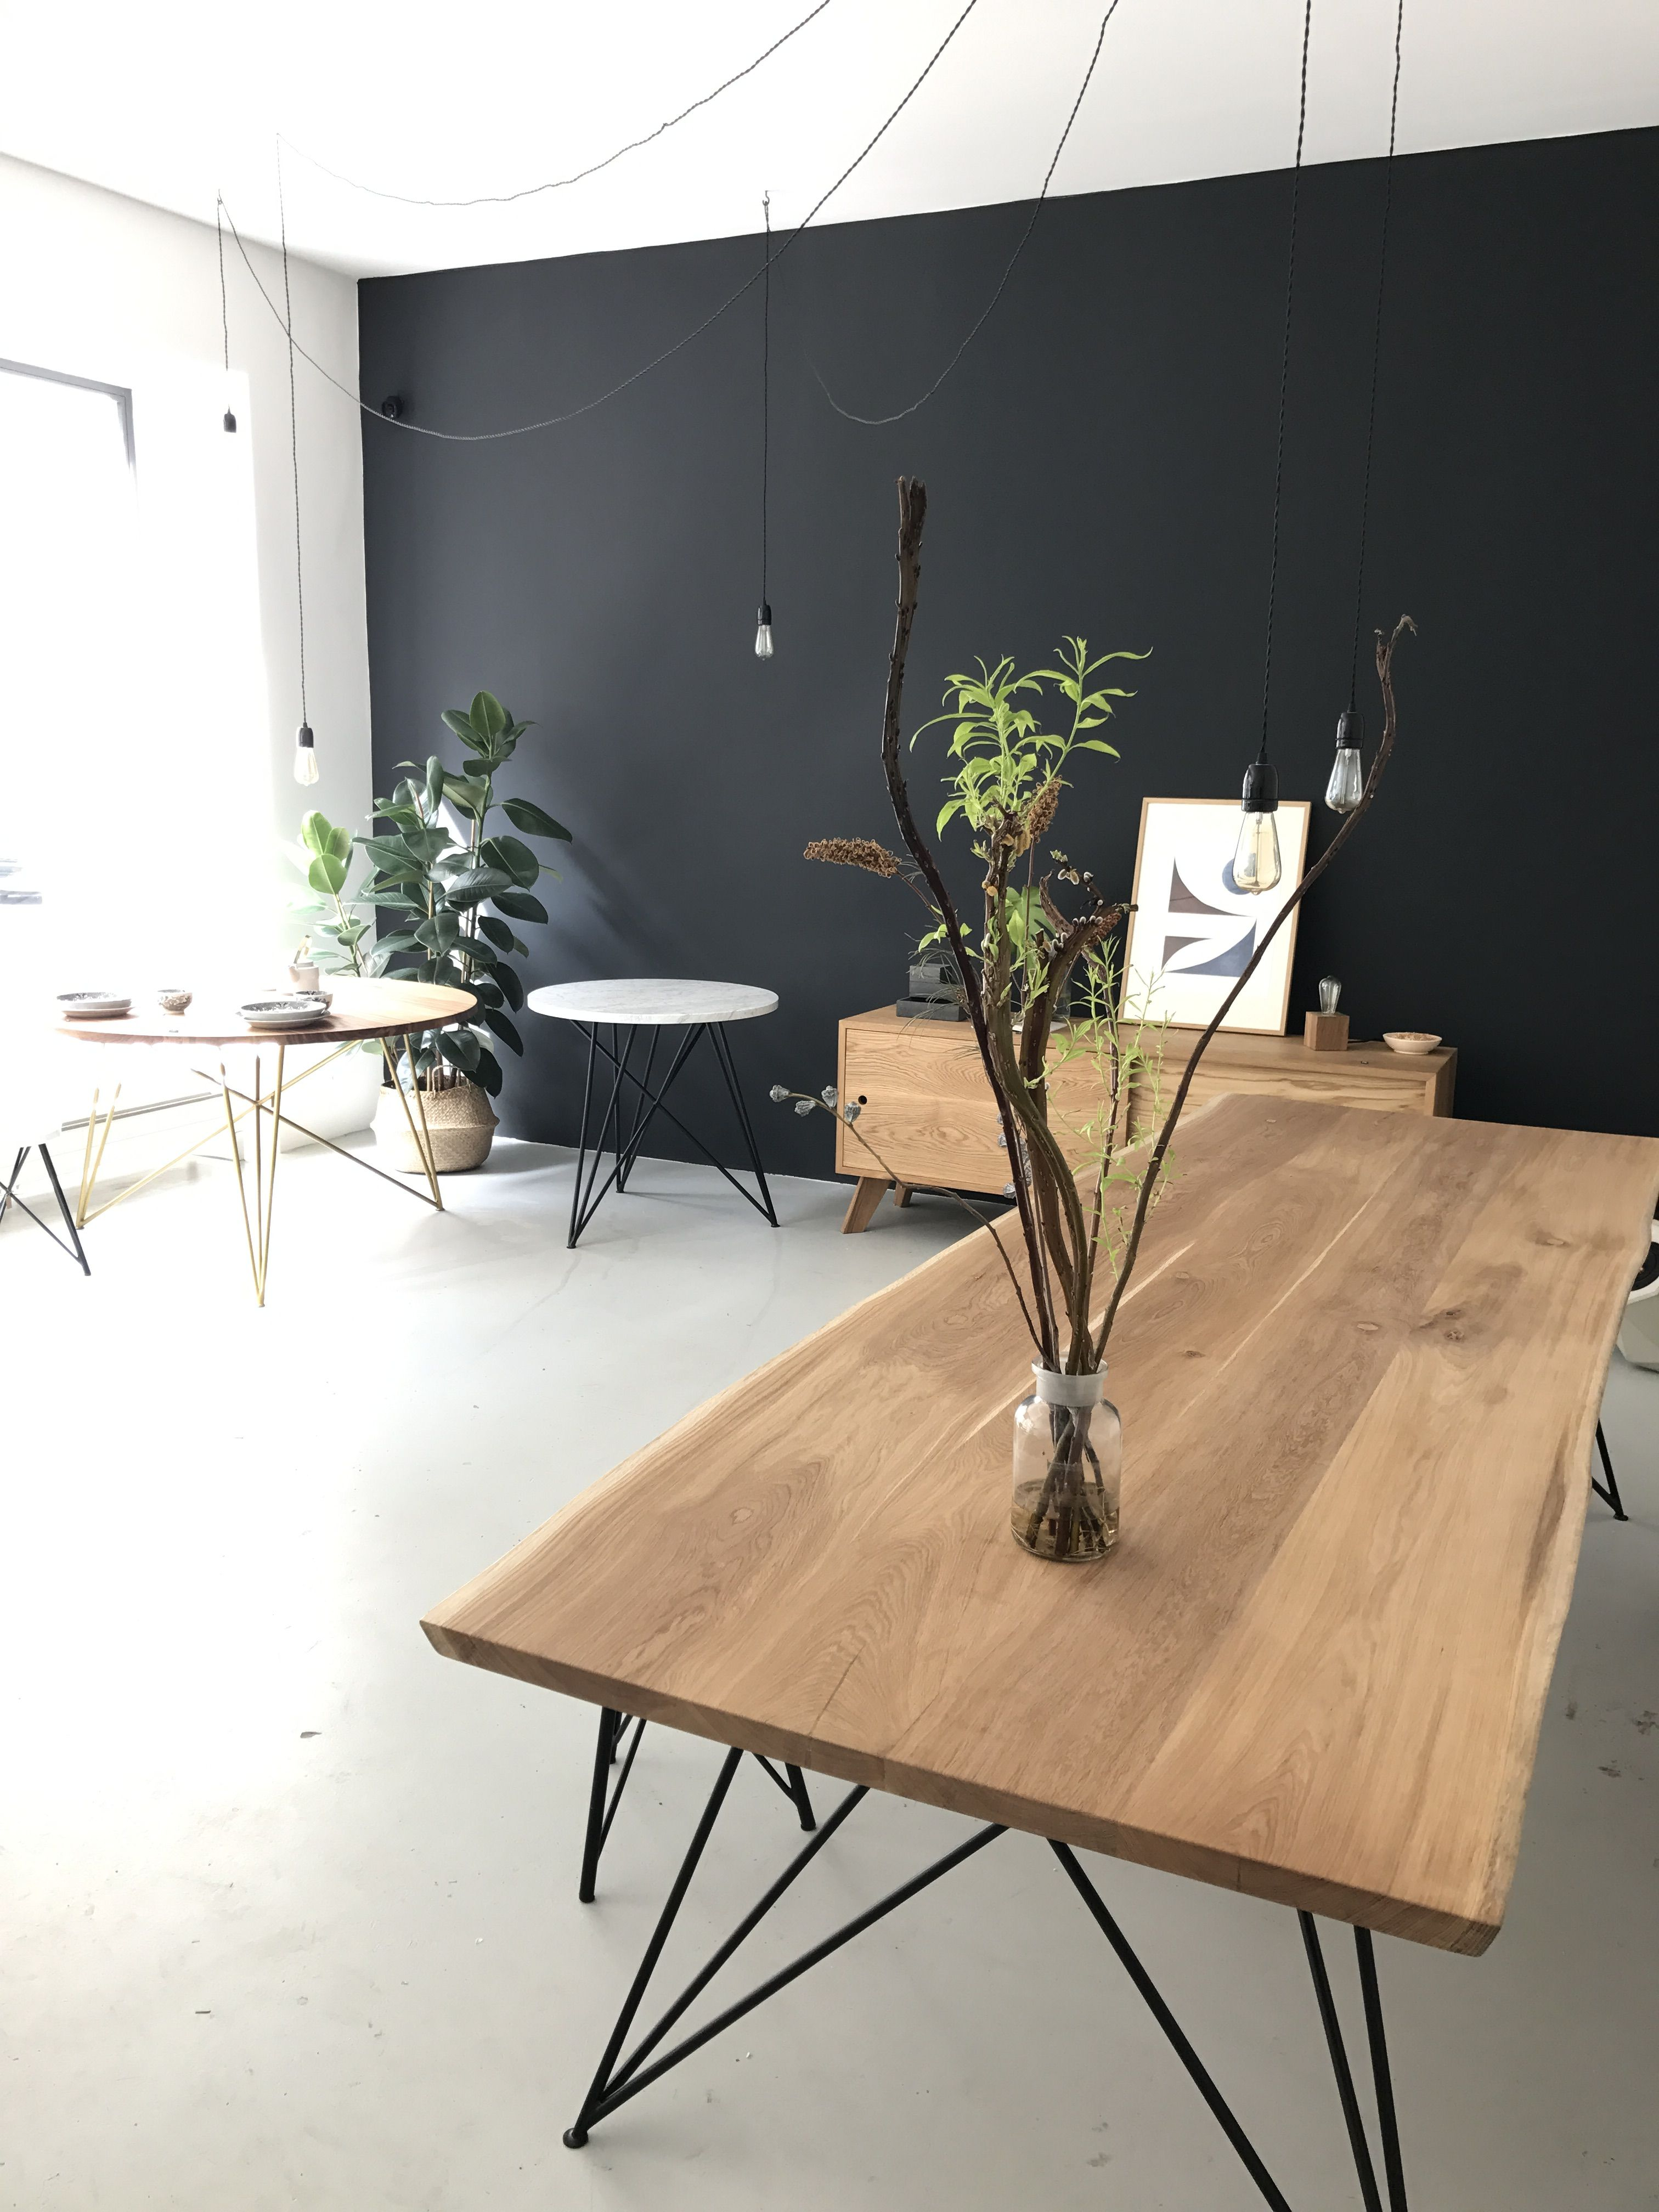 Our Oak Table Slim | NUTSANDWOODS - Furniture Design | Pinterest ...